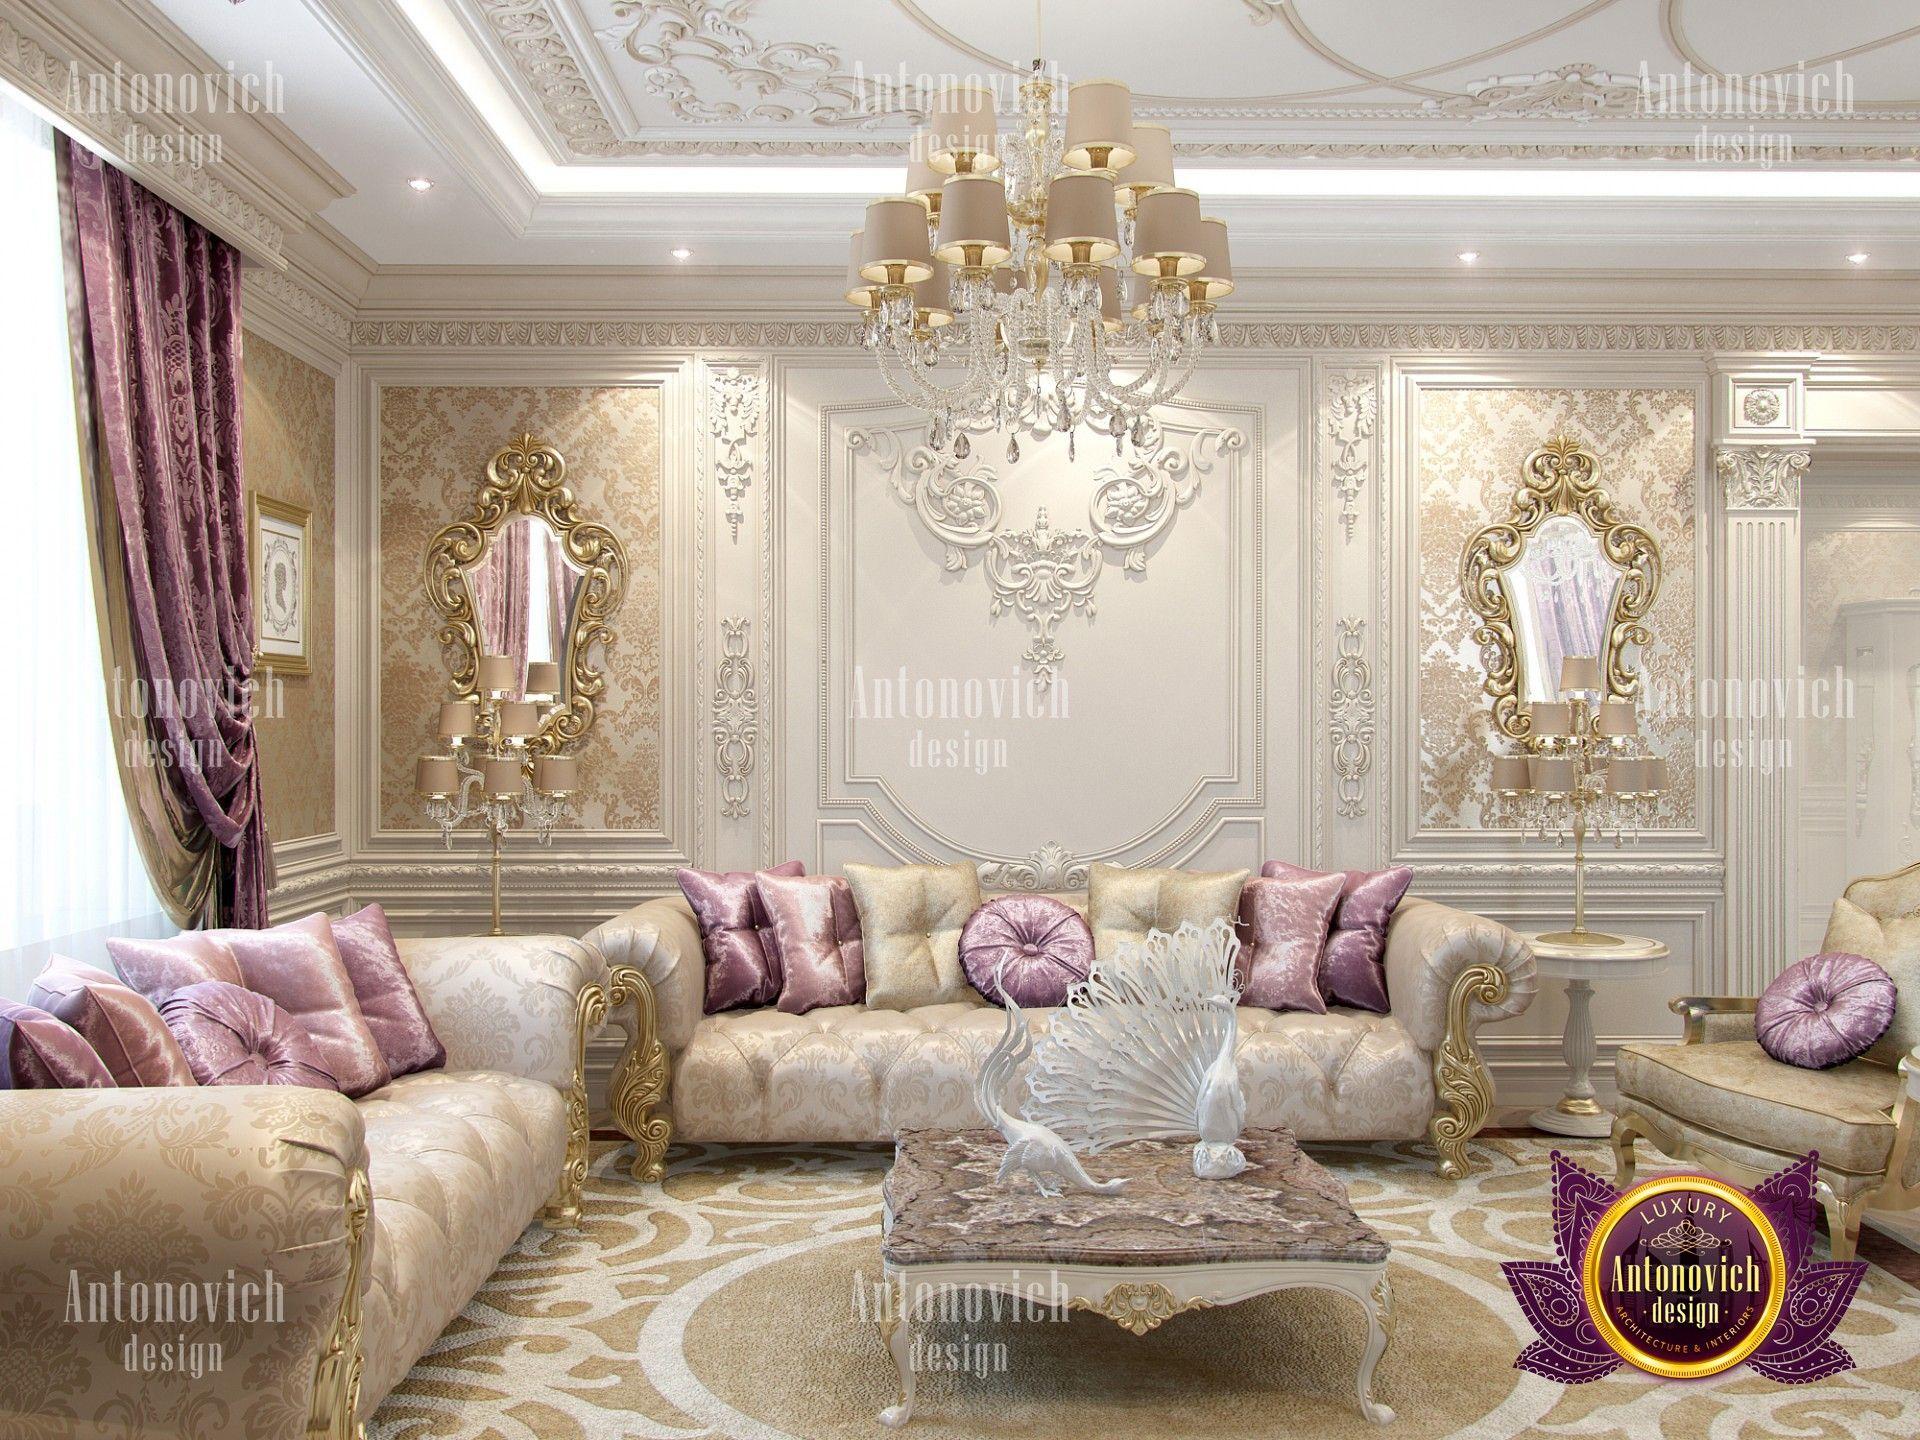 Elegant Living Room Design (With images) | Classic ...